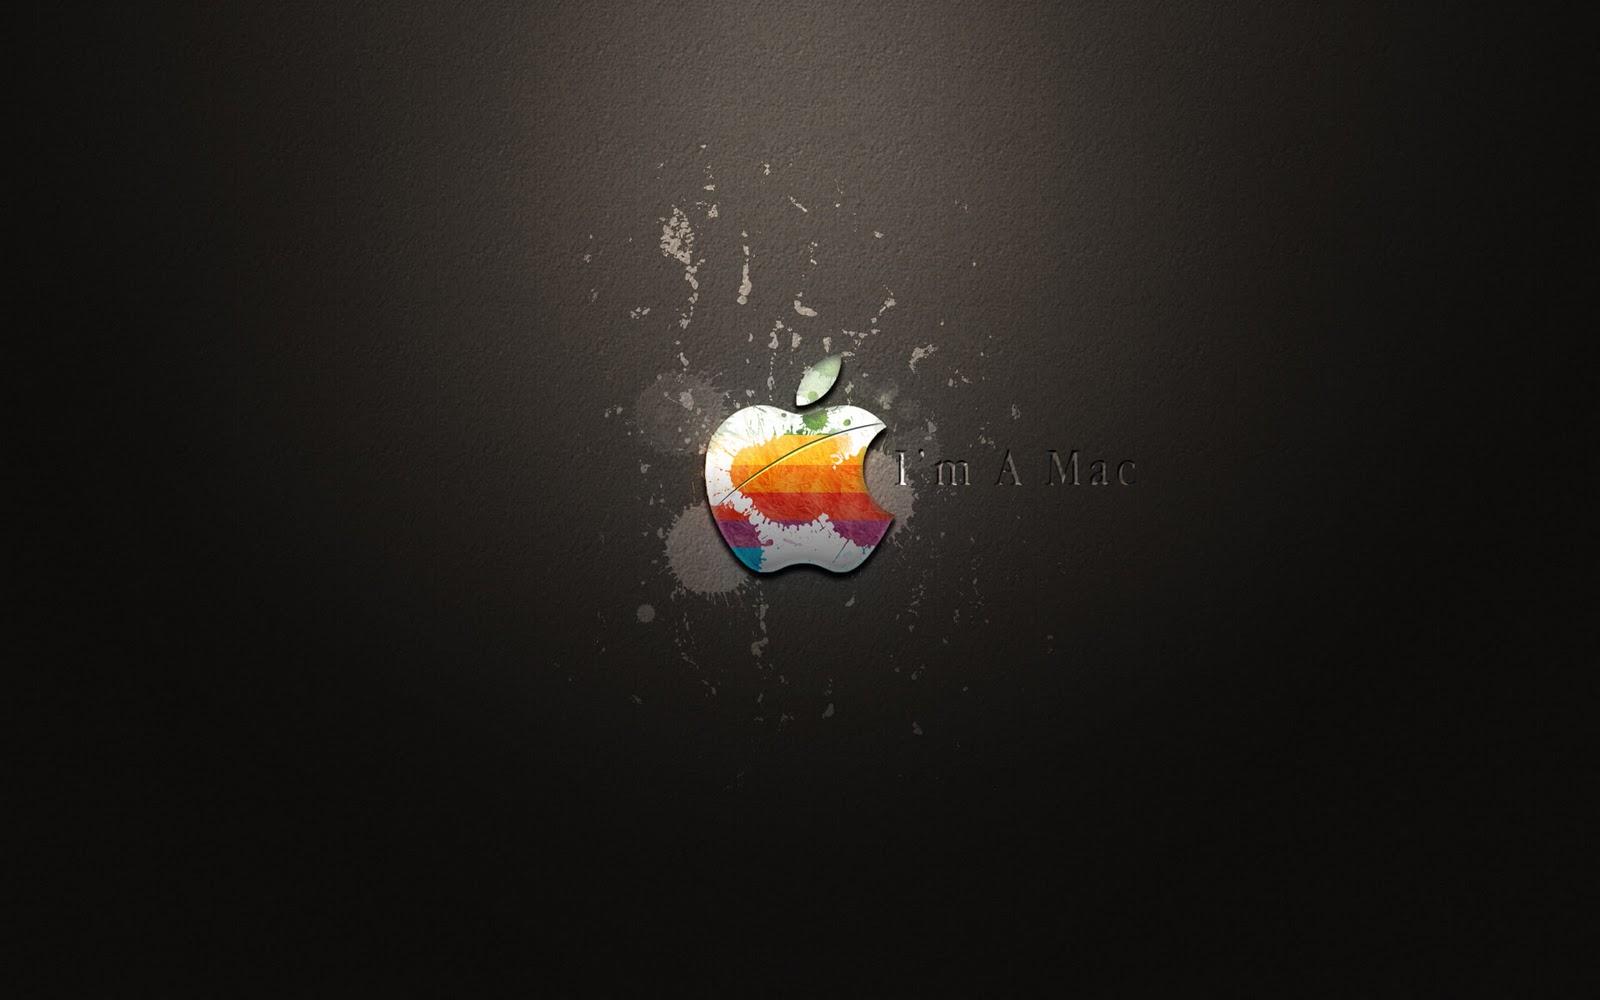 http://2.bp.blogspot.com/_E26Ndy_oKVc/TNWrk0U5n1I/AAAAAAAAAPw/iHookqFDB6M/s1600/Apple_HD_Wallpapers_www.laba.ws_+001.jpg